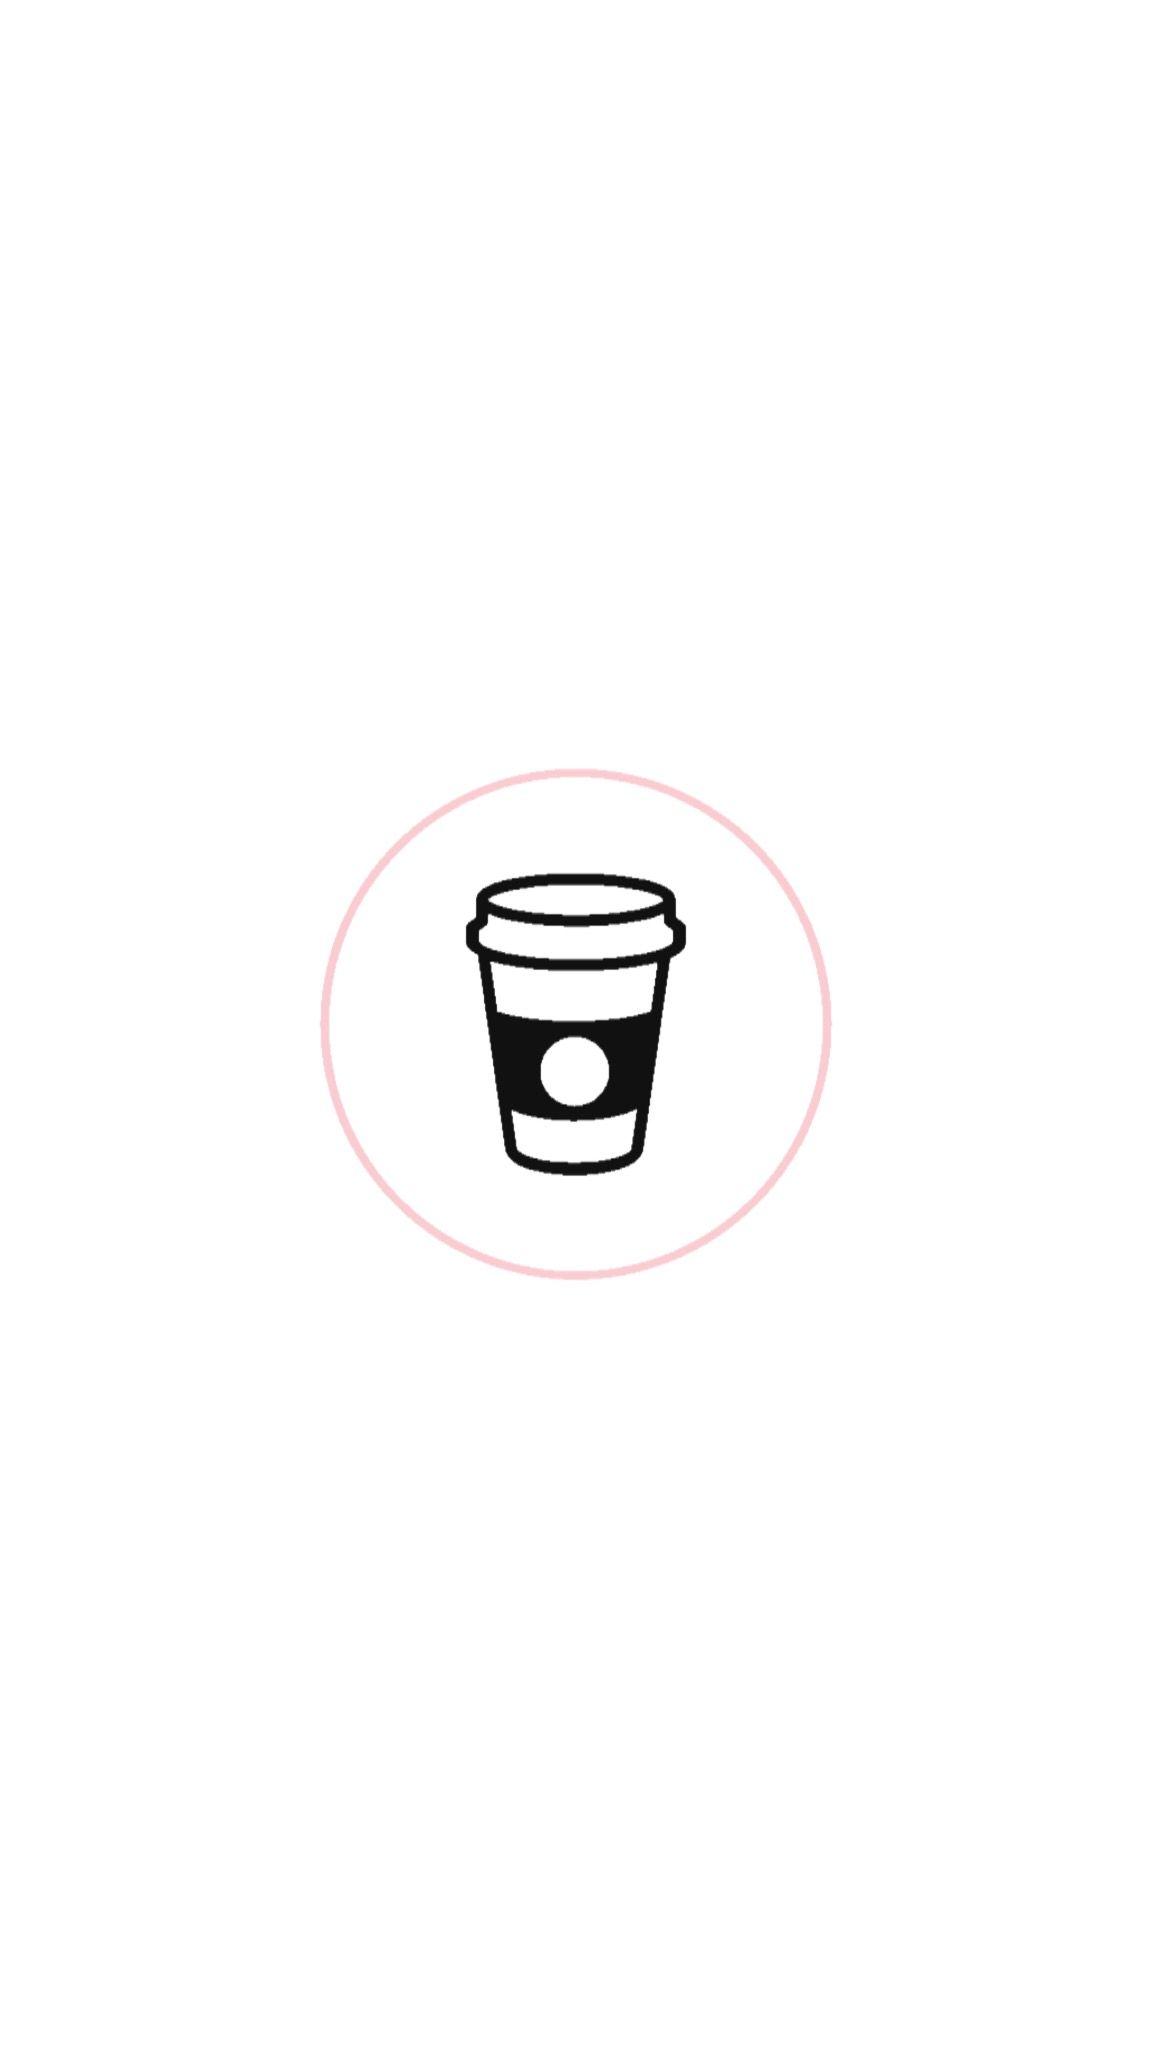 Coffee | Coffee icon, Instagram icons, Instagram emoji